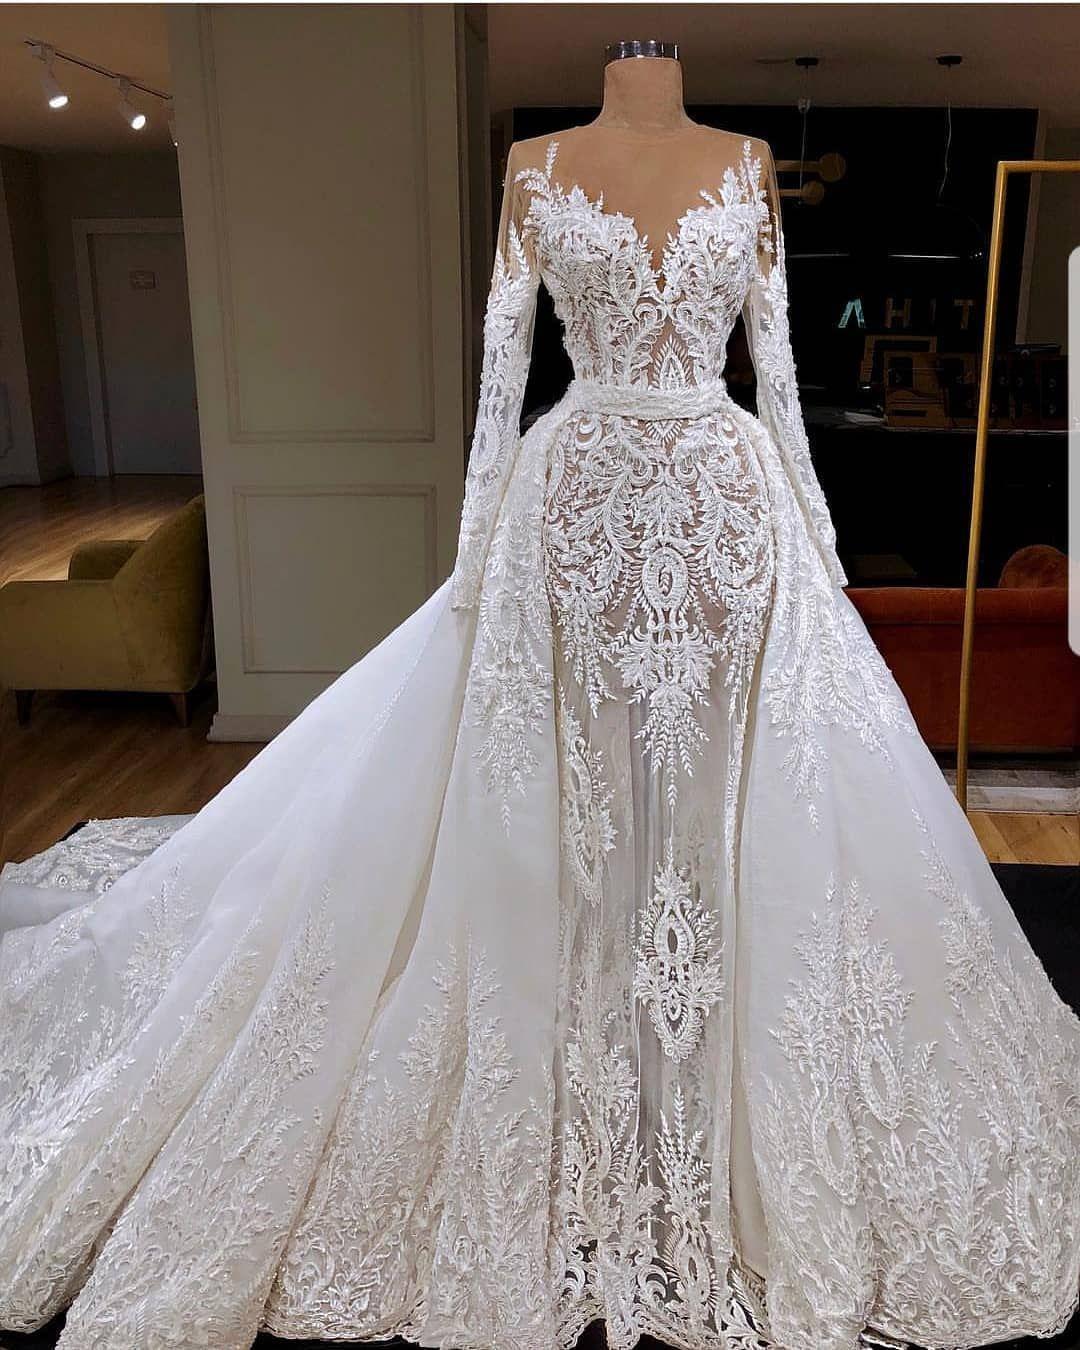 Custom made wedding dress  Custommade wedding dress with a hand embroidery Send us a photo of